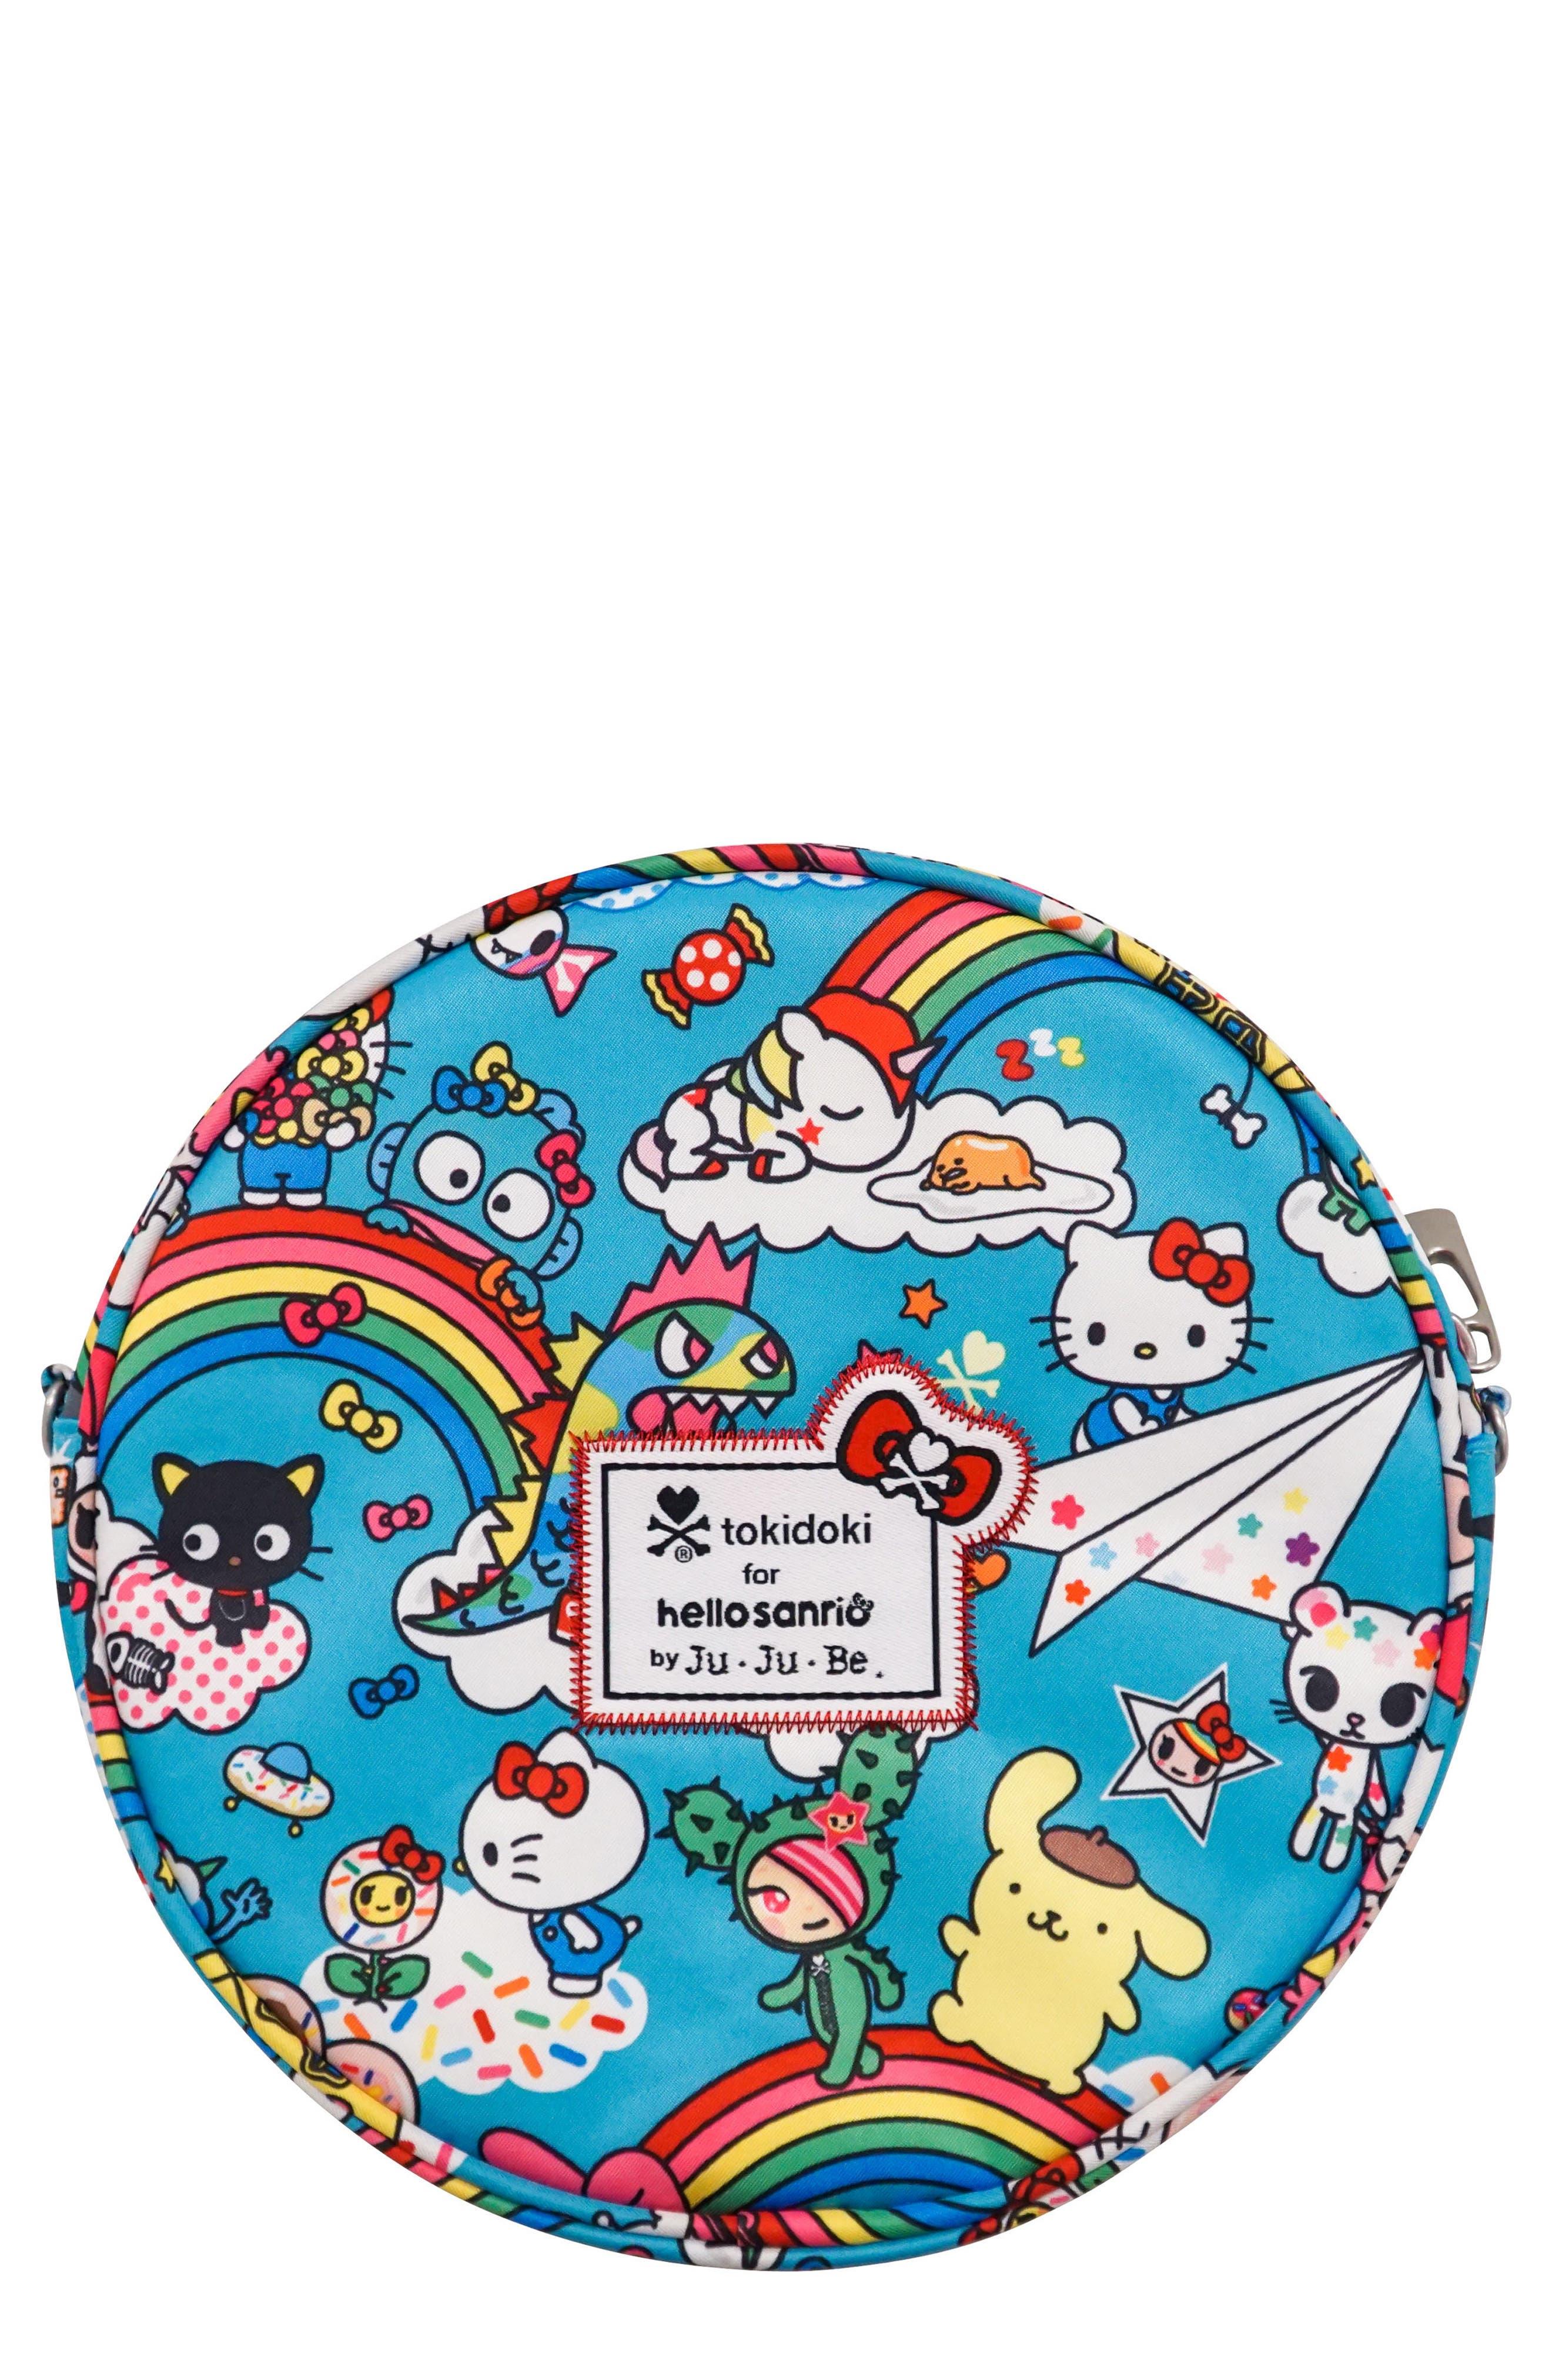 x tokidoki for Hello Sanrio Rainbow Dreams Be Bop Mini Bag,                             Main thumbnail 1, color,                             433